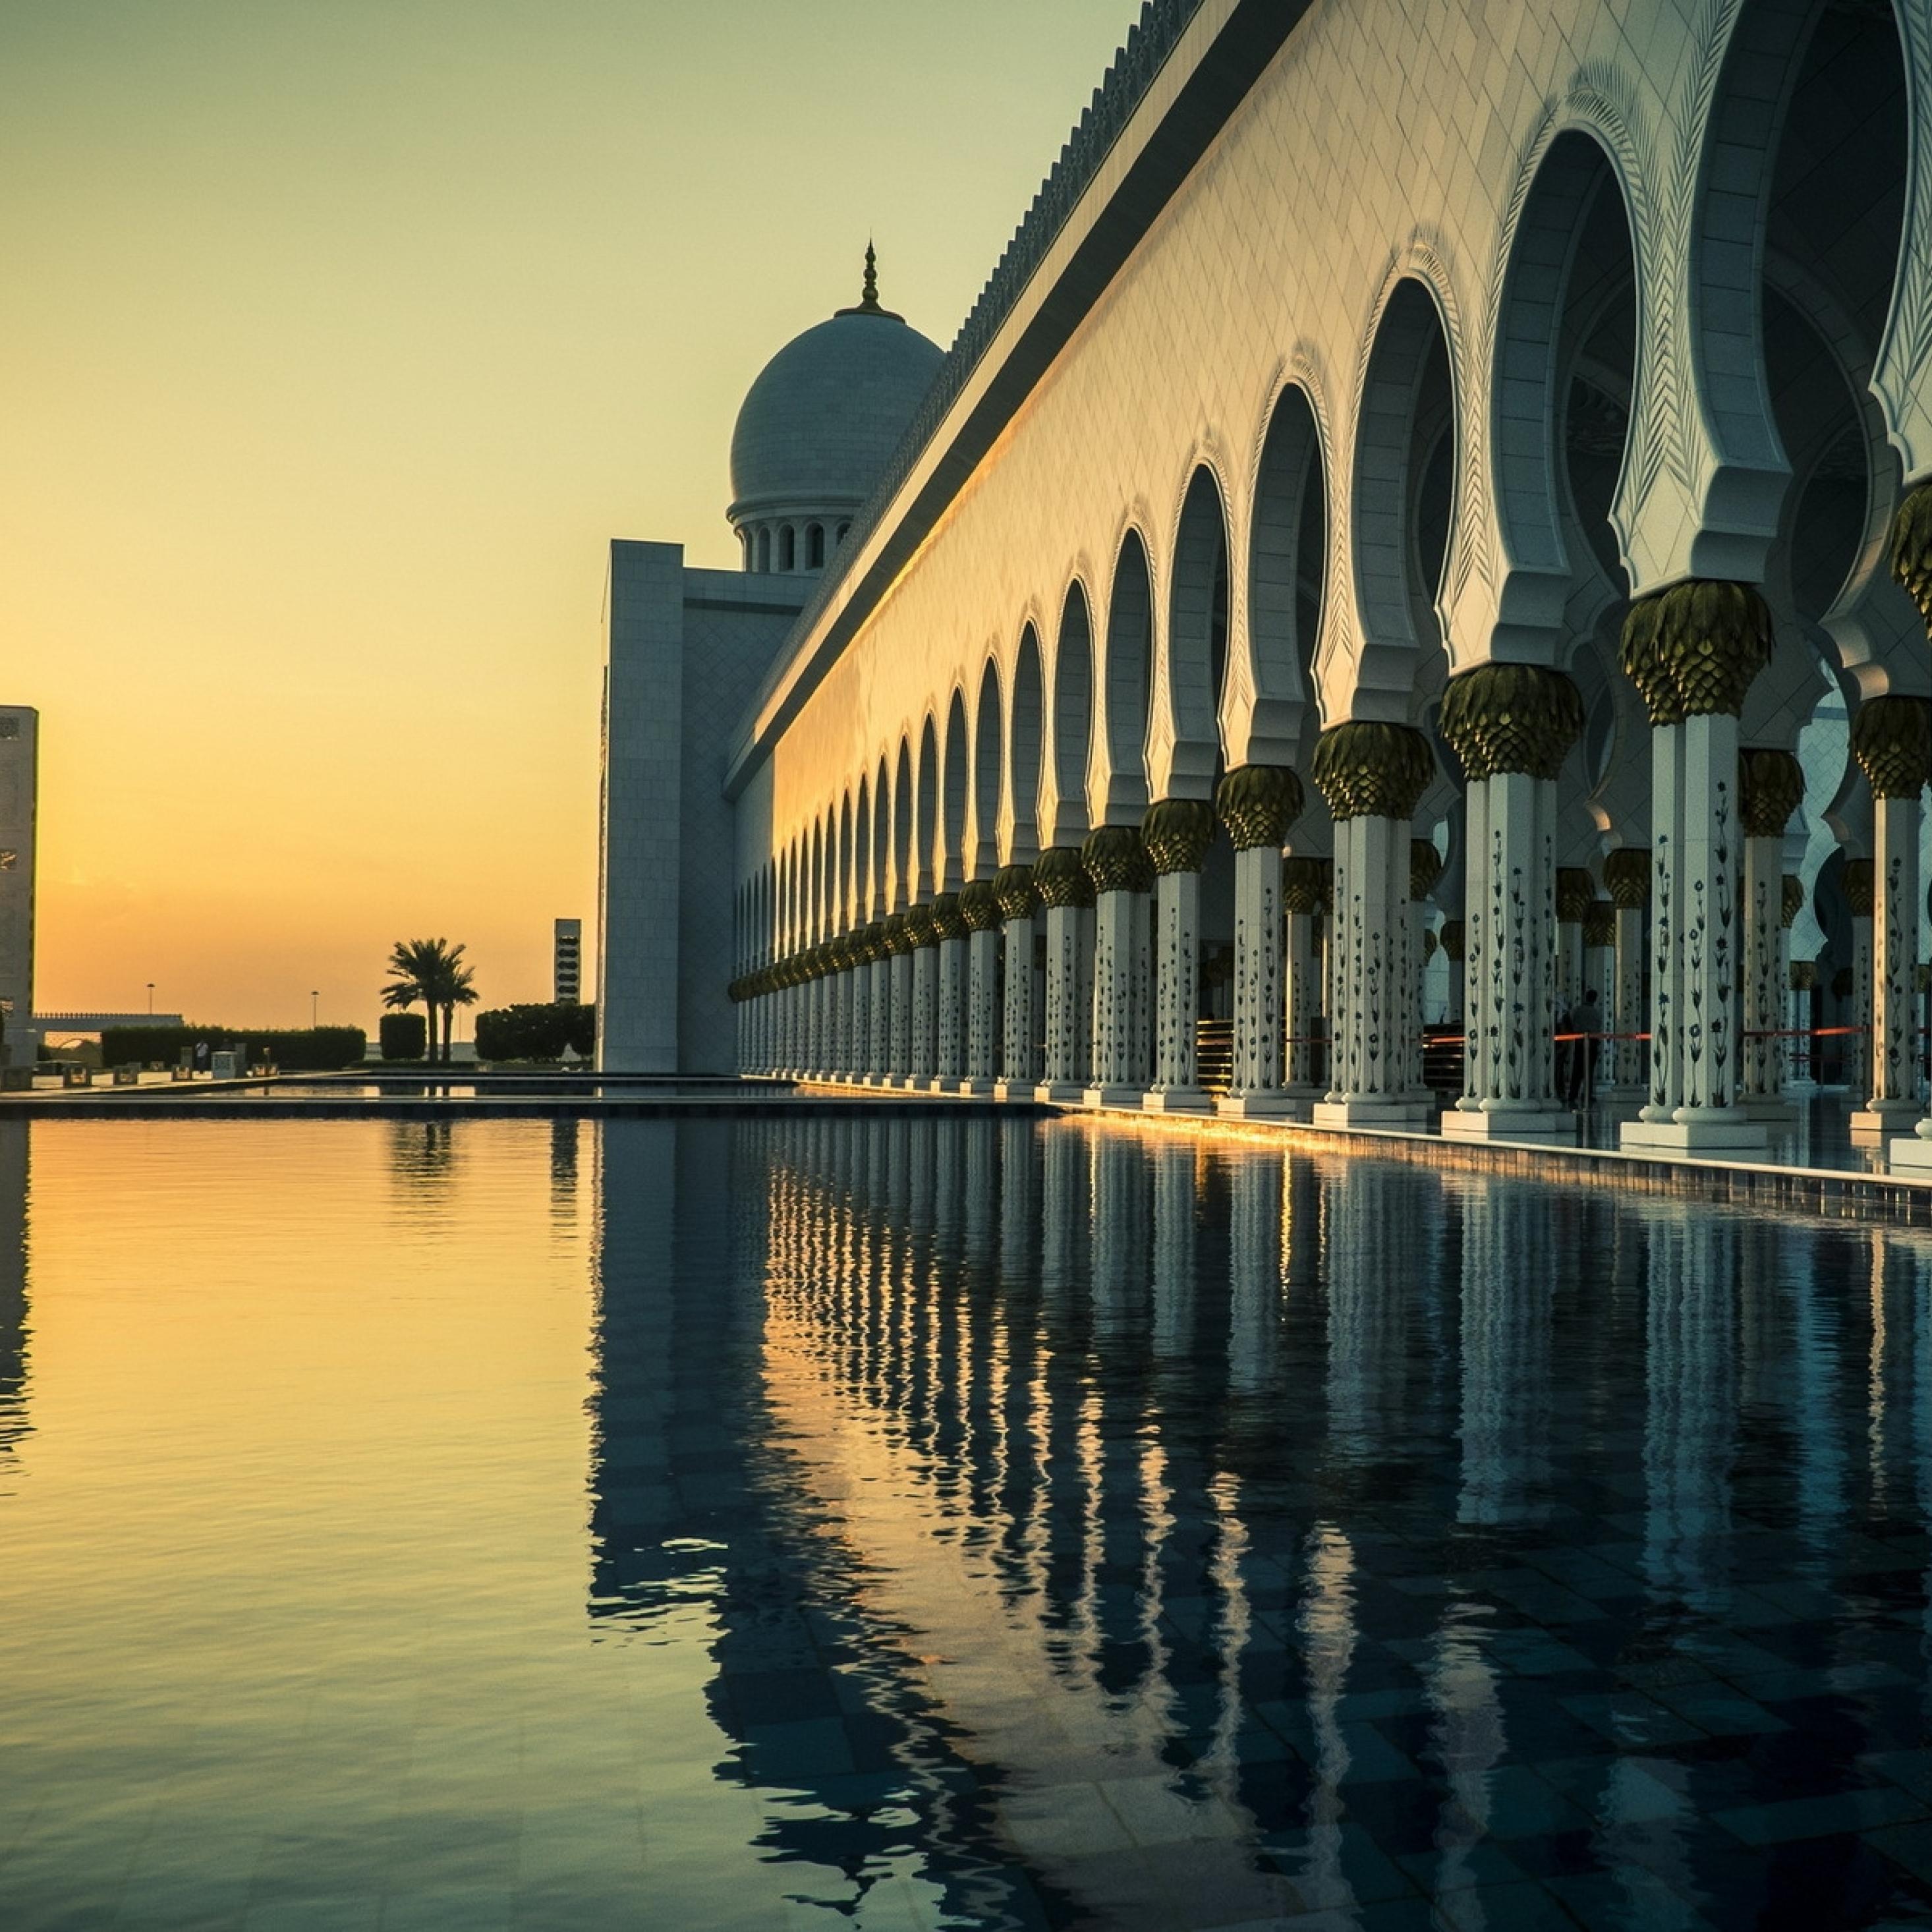 2932x2932 Dubai, Water, Beautiful Ipad Pro Retina Display